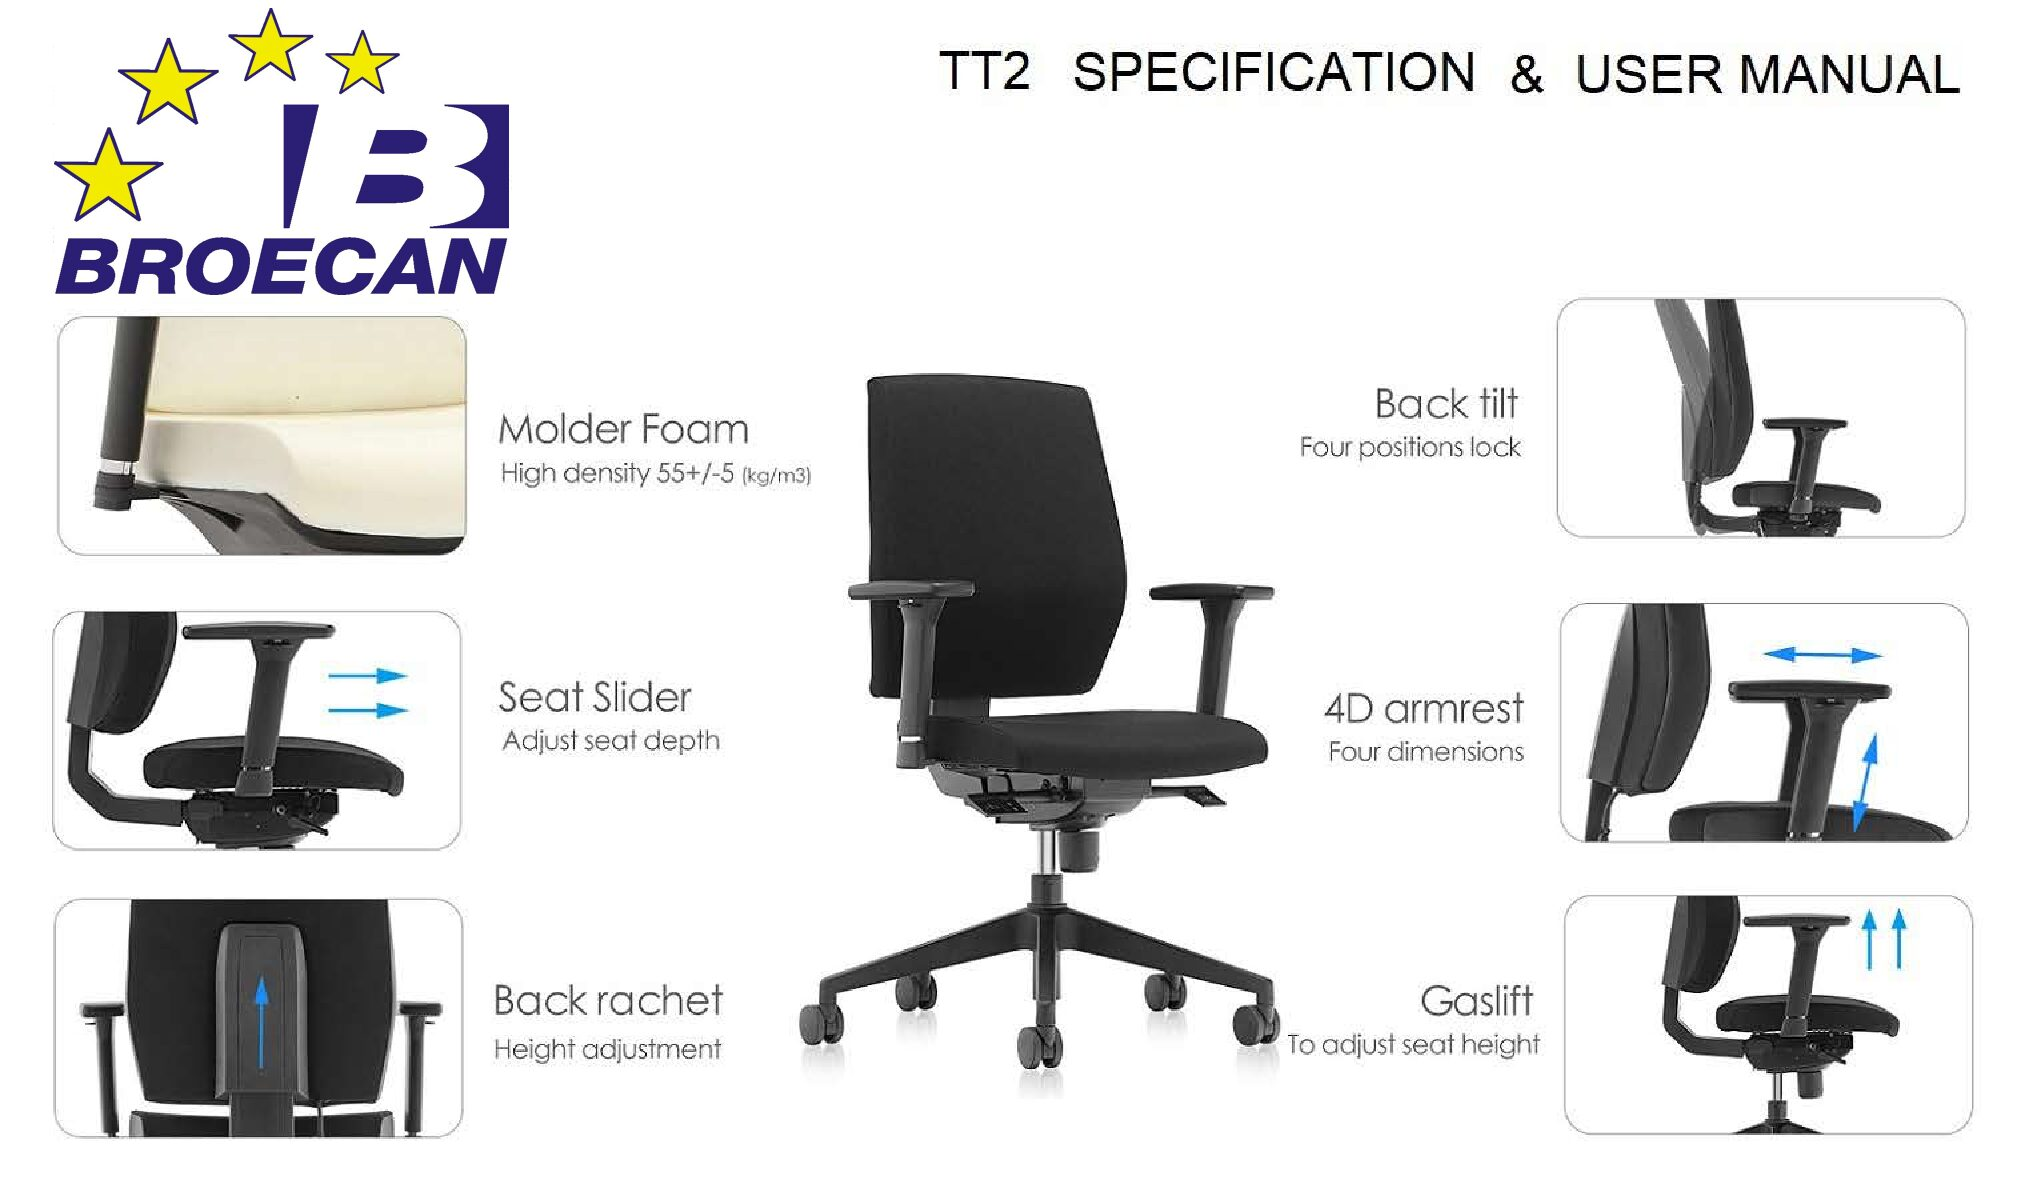 OKA Schreibtisch 180×80 inkl. neuer Bürodrehstuhl Eur 399,00 inkl.Mwst